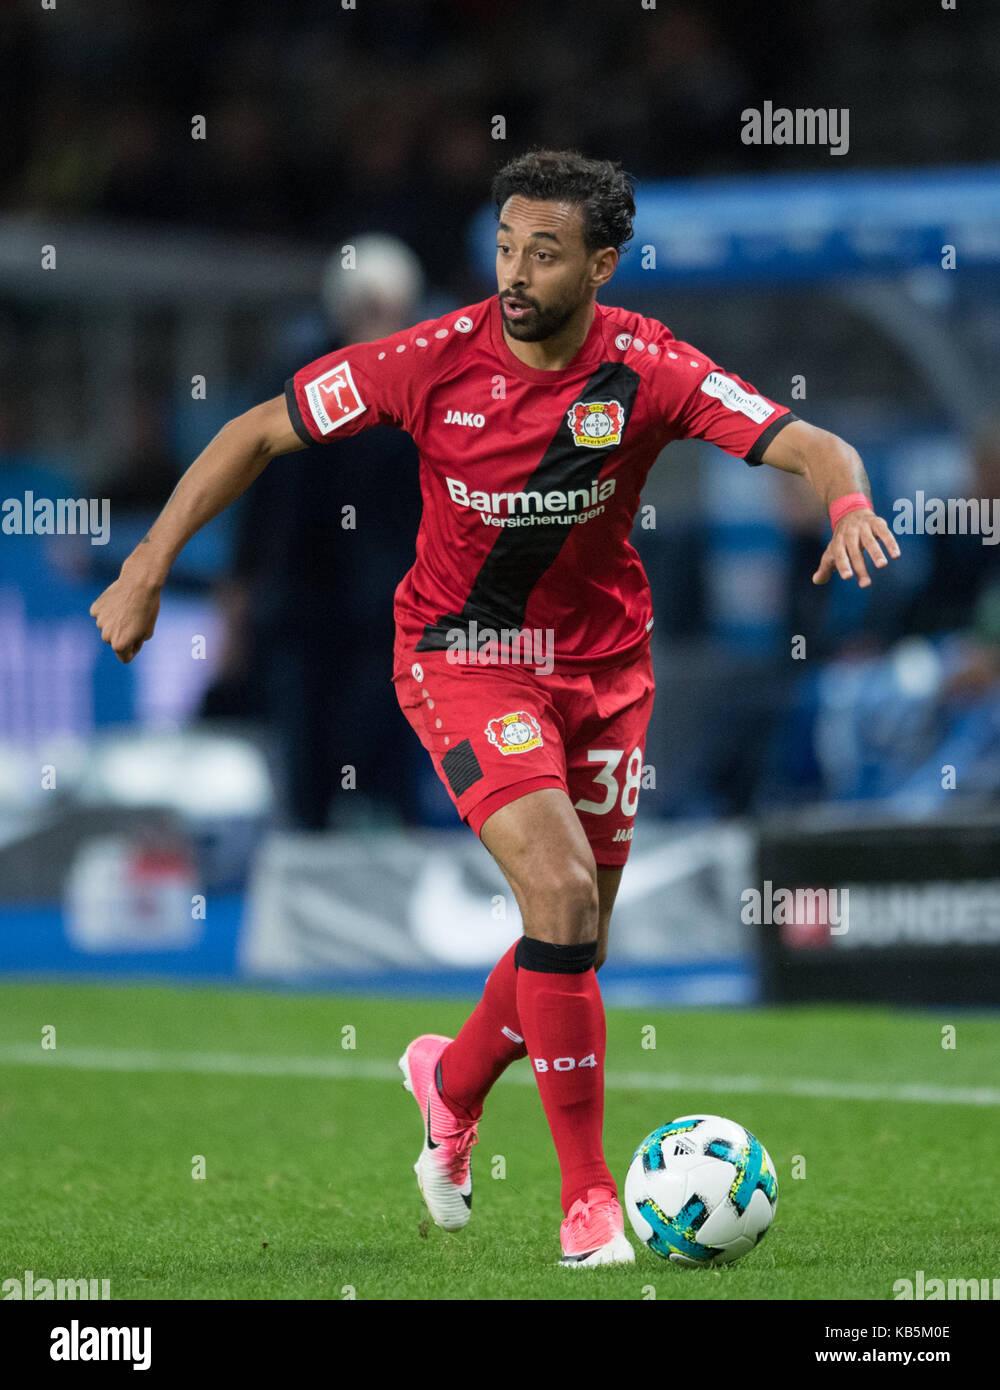 Berlin, Deutschland. 20th Sep, 2017. Karim BELLARABI (LEV) Fussball 1. Bundesliga, 5. Spieltag, Hertha BSC Berlin - Stock Image